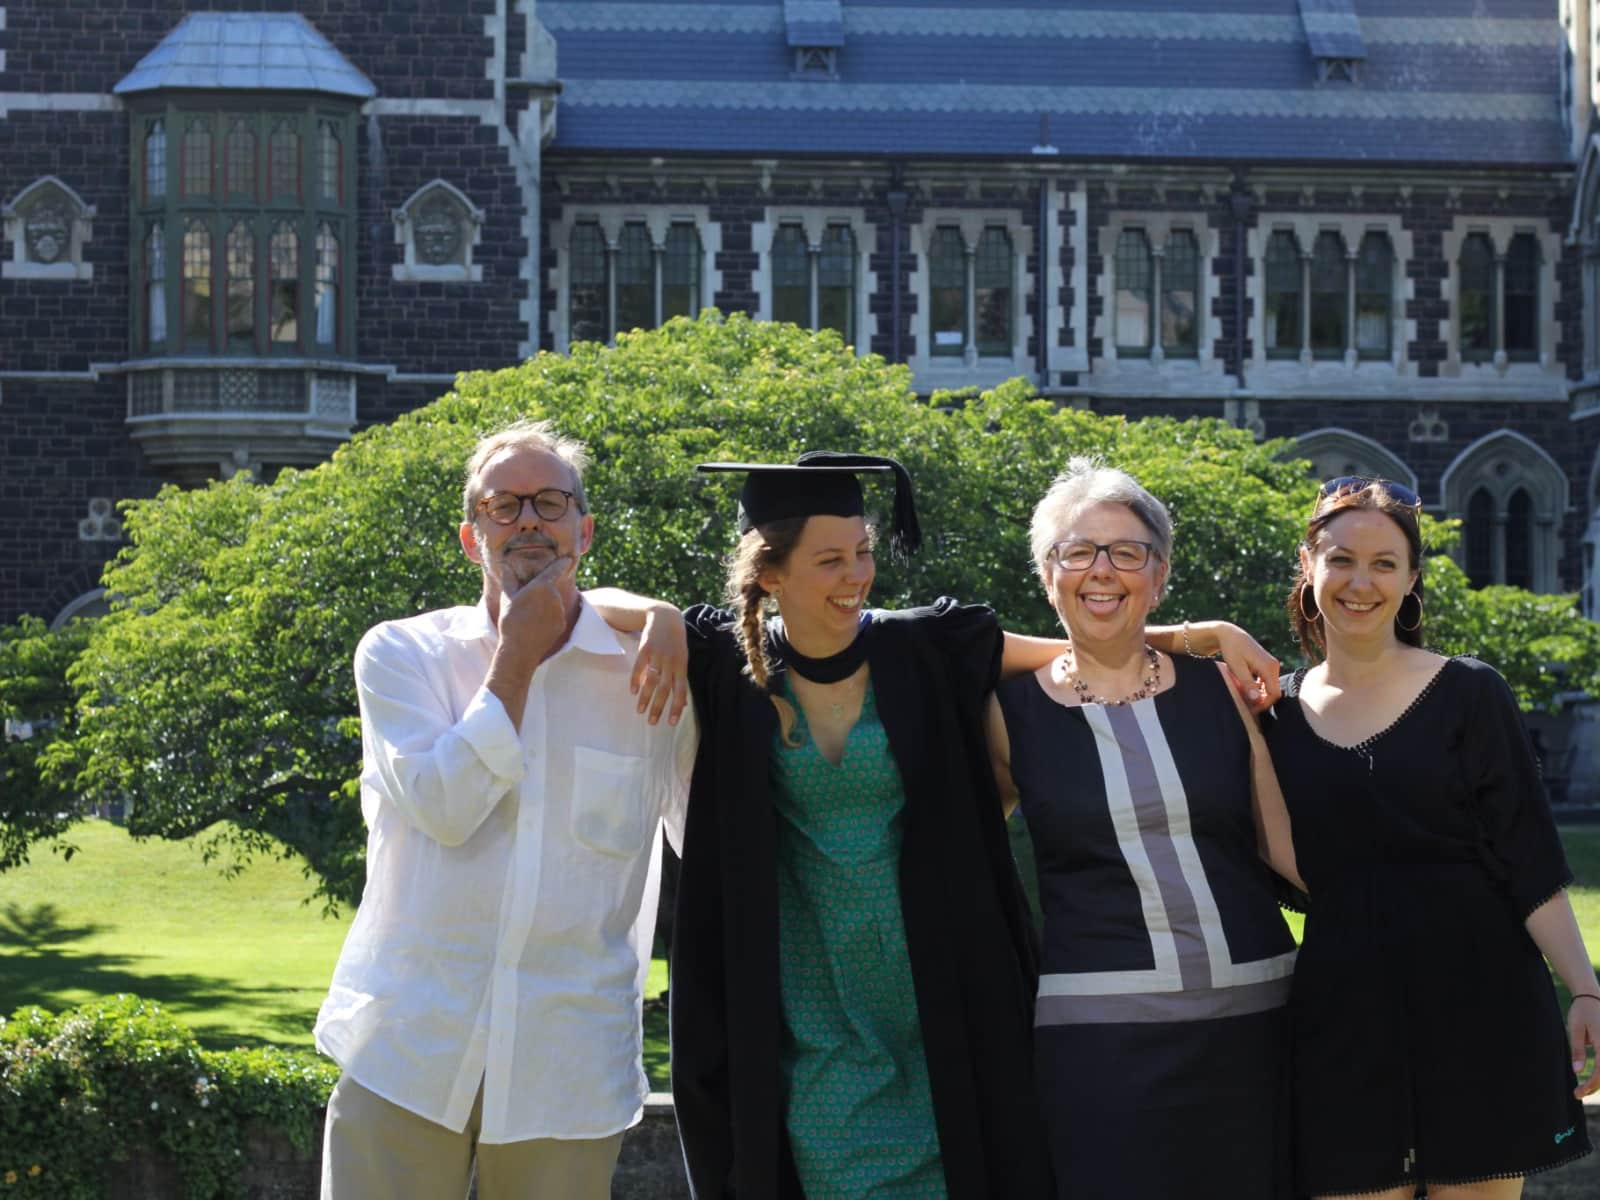 Stephen & barbara & Barbara from Oxford, New Zealand